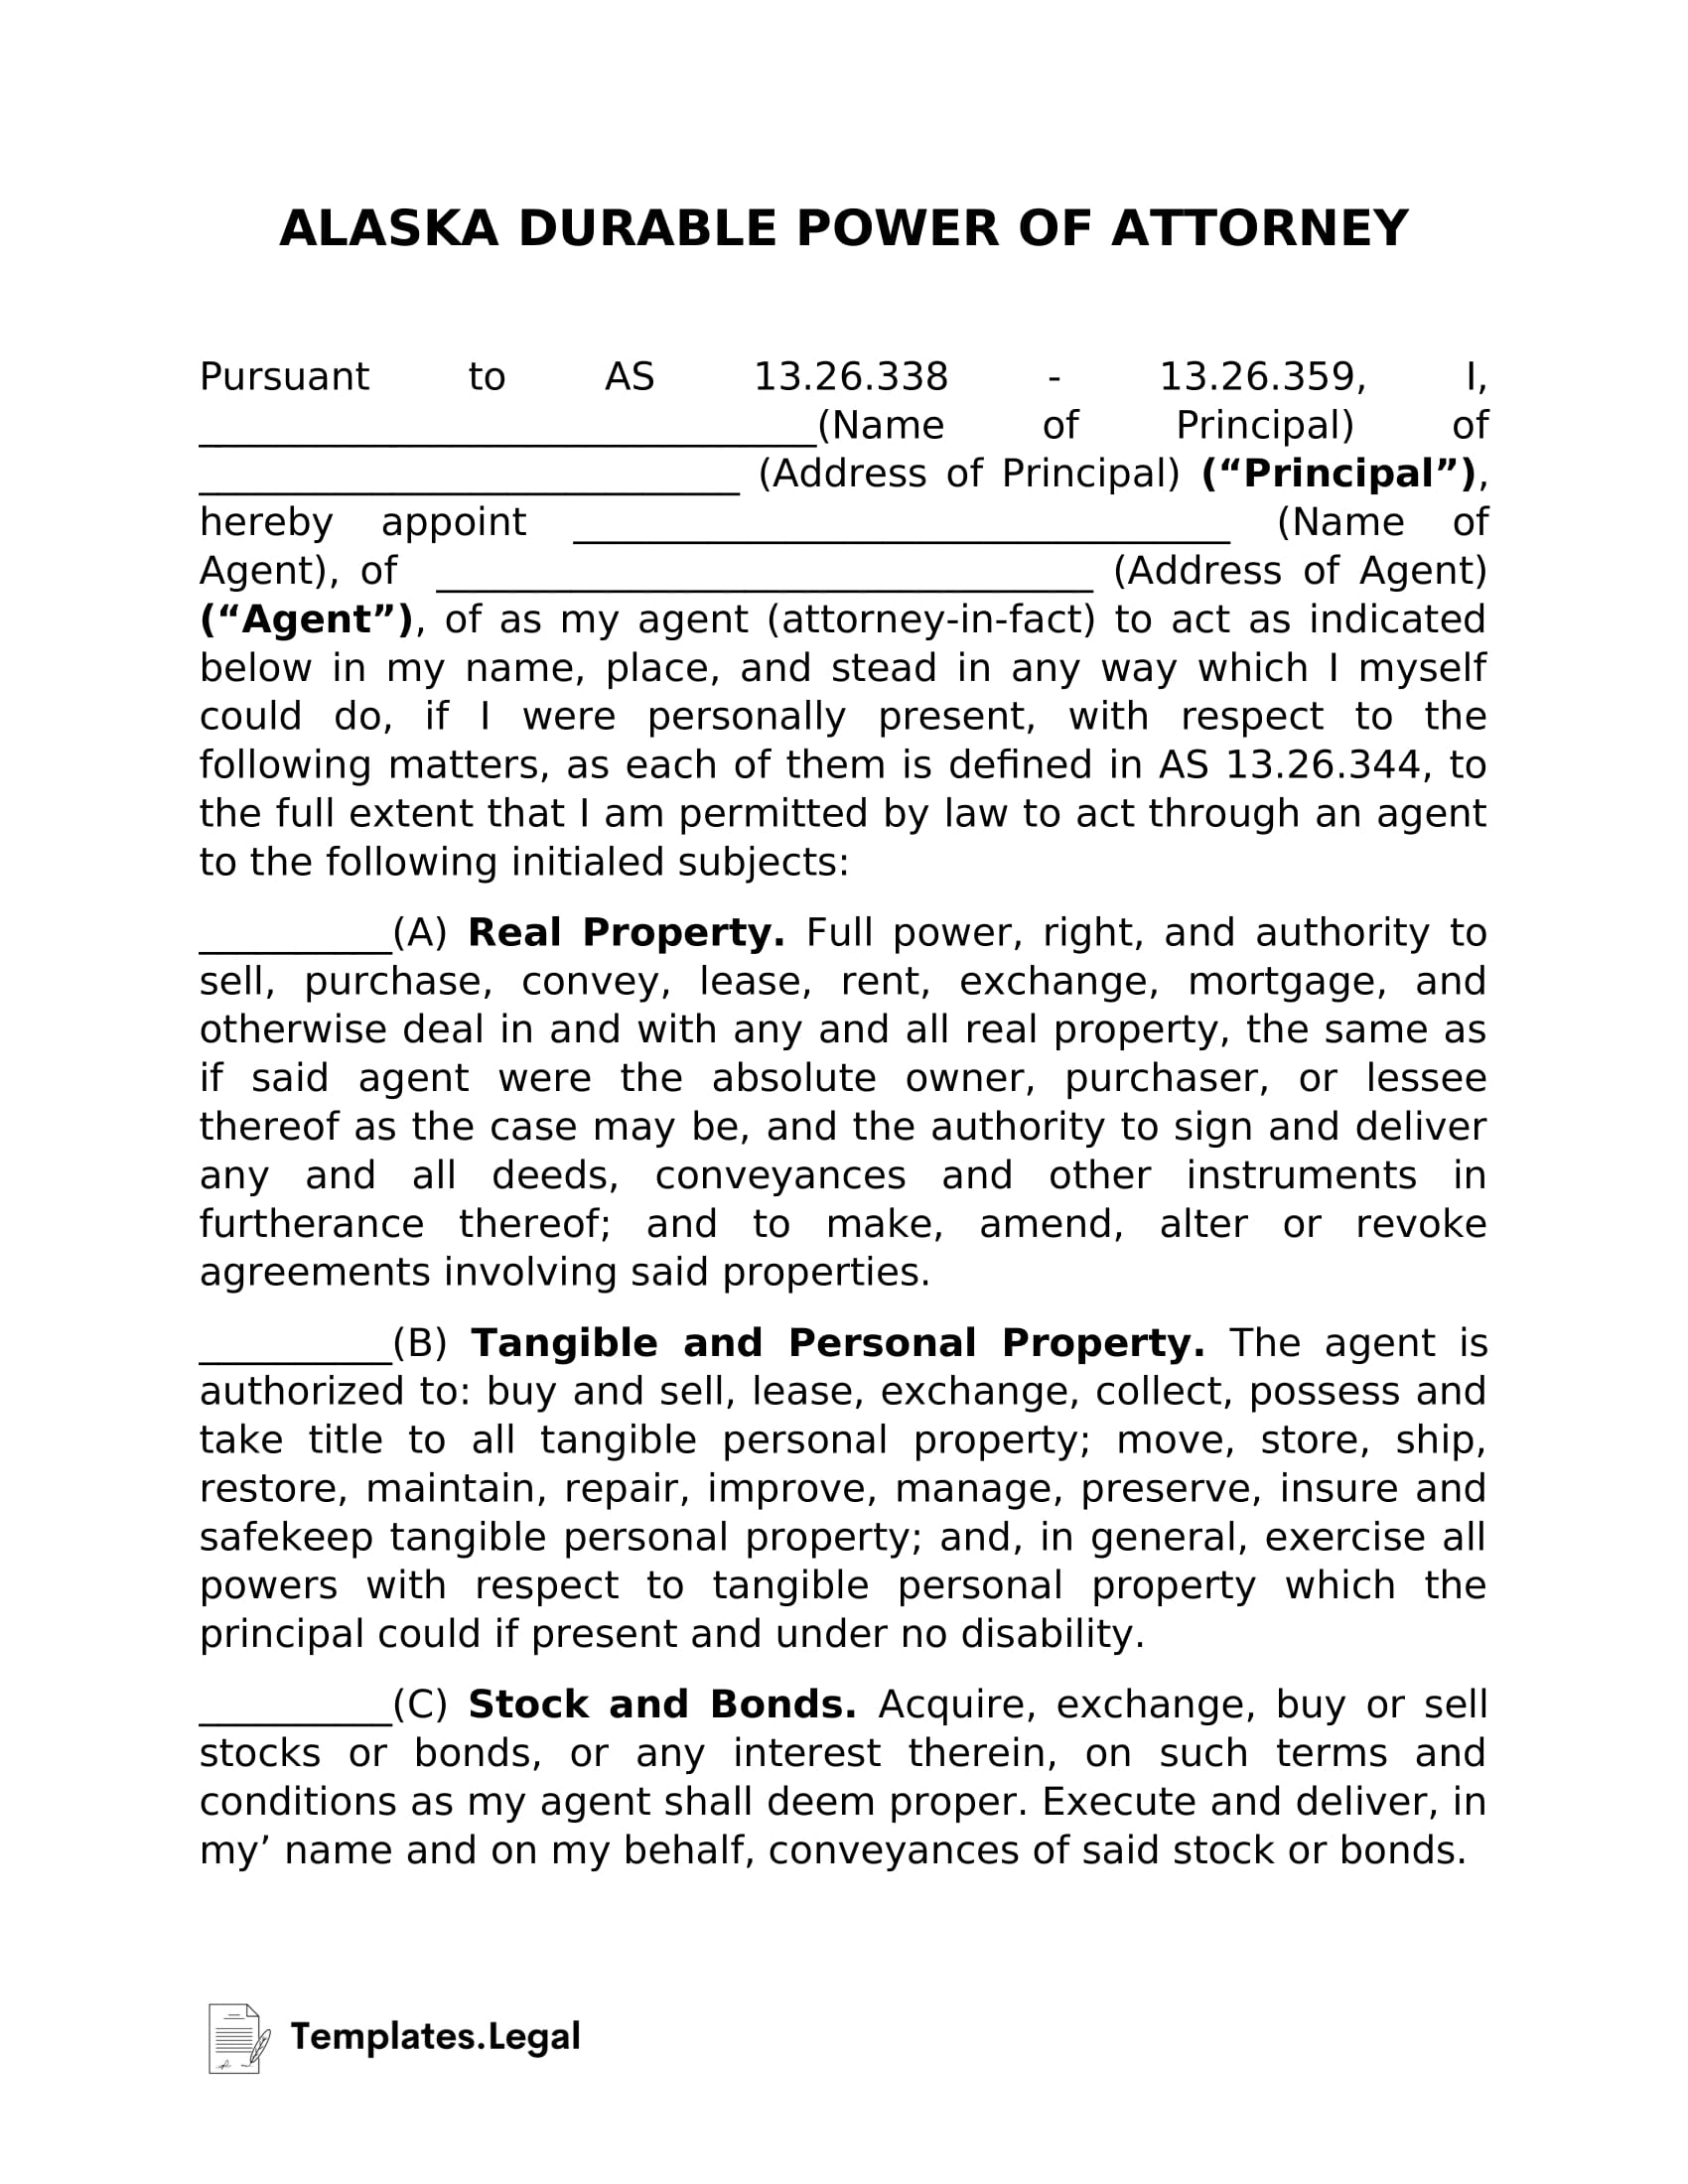 Alaska Durable Power of Attorney - Templates.Legal